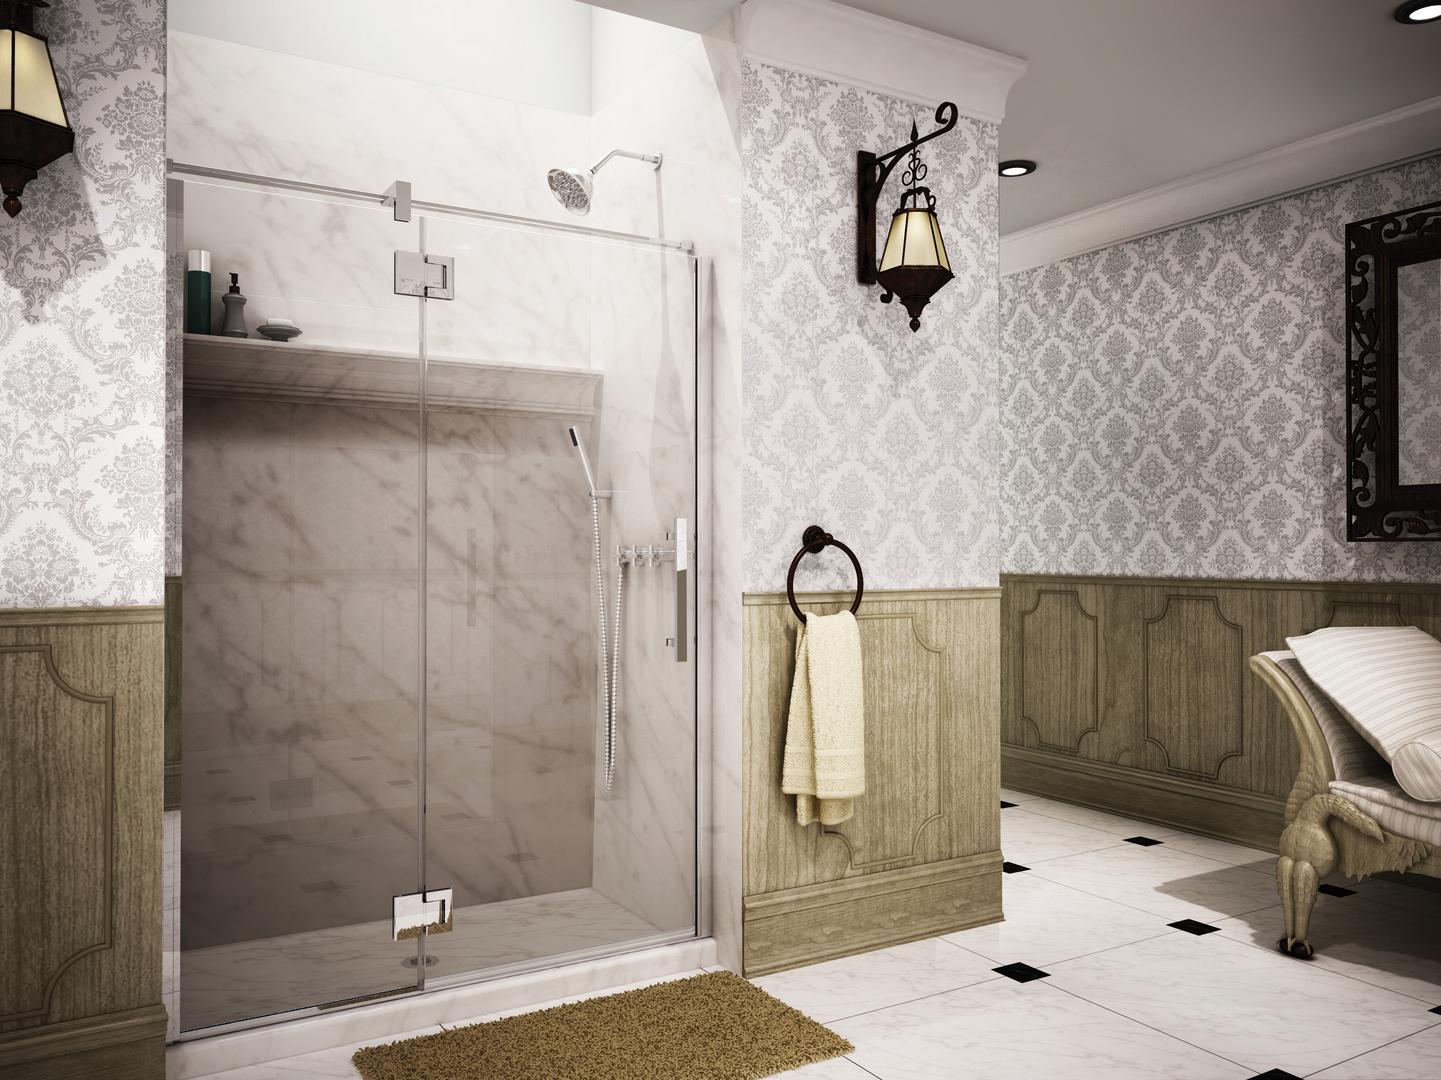 Bathroom Remodeling Kitchens Quantum Showrooms Memphis Tn - Bathroom remodeling showrooms